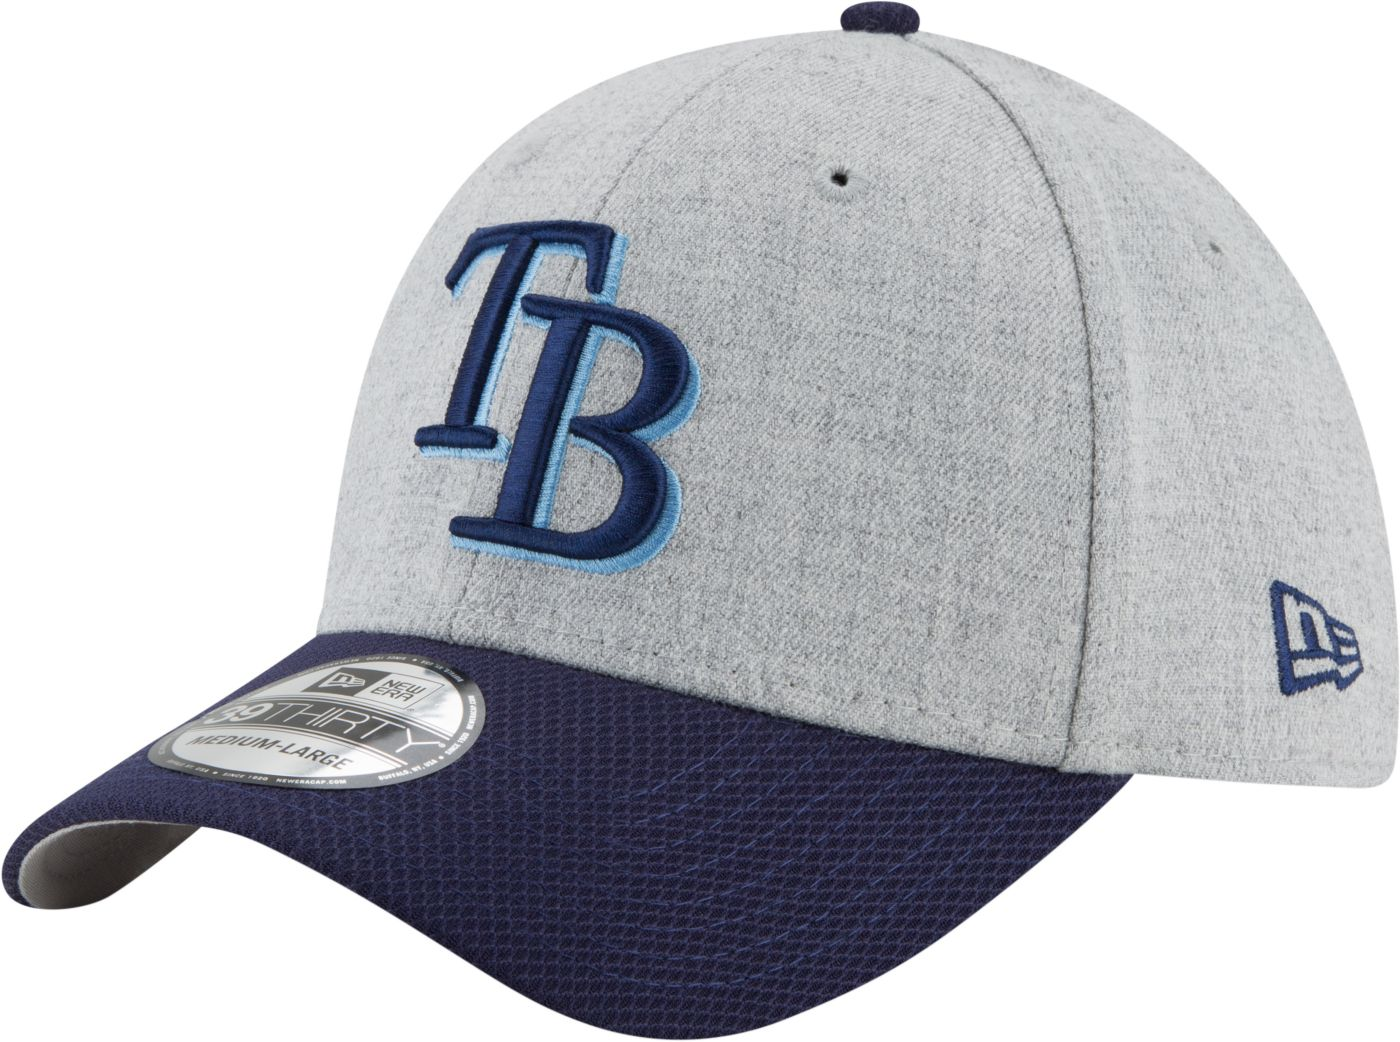 New Era Men's Tampa Bay Rays 39Thirty Change Up Redux Grey Stretch Fit Hat